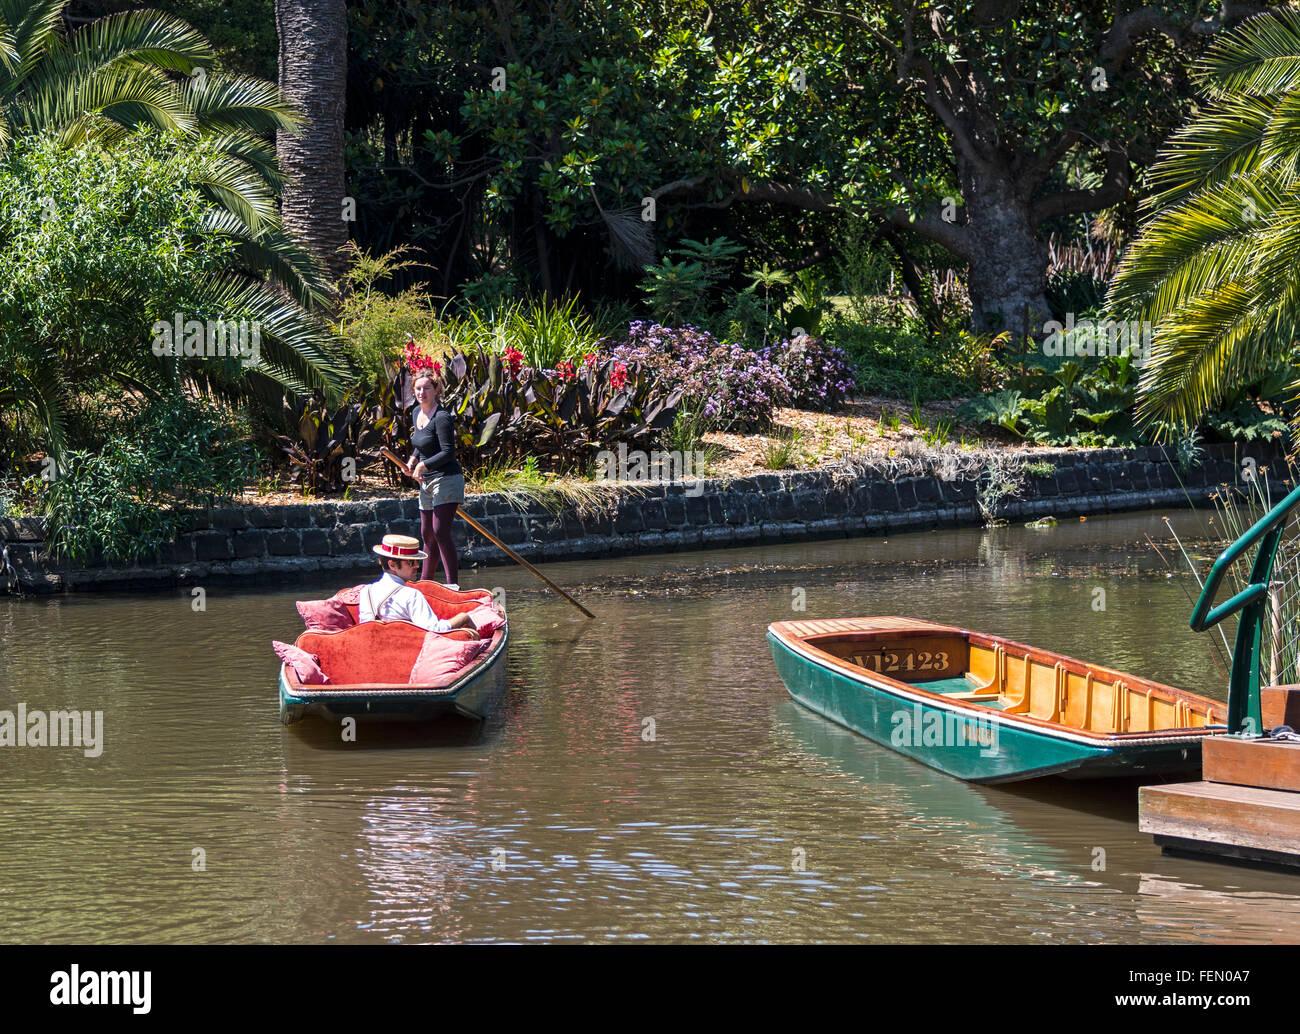 Punts and Punter, The Royal Botanic Gardens, Melbourne, Australia - Stock Image